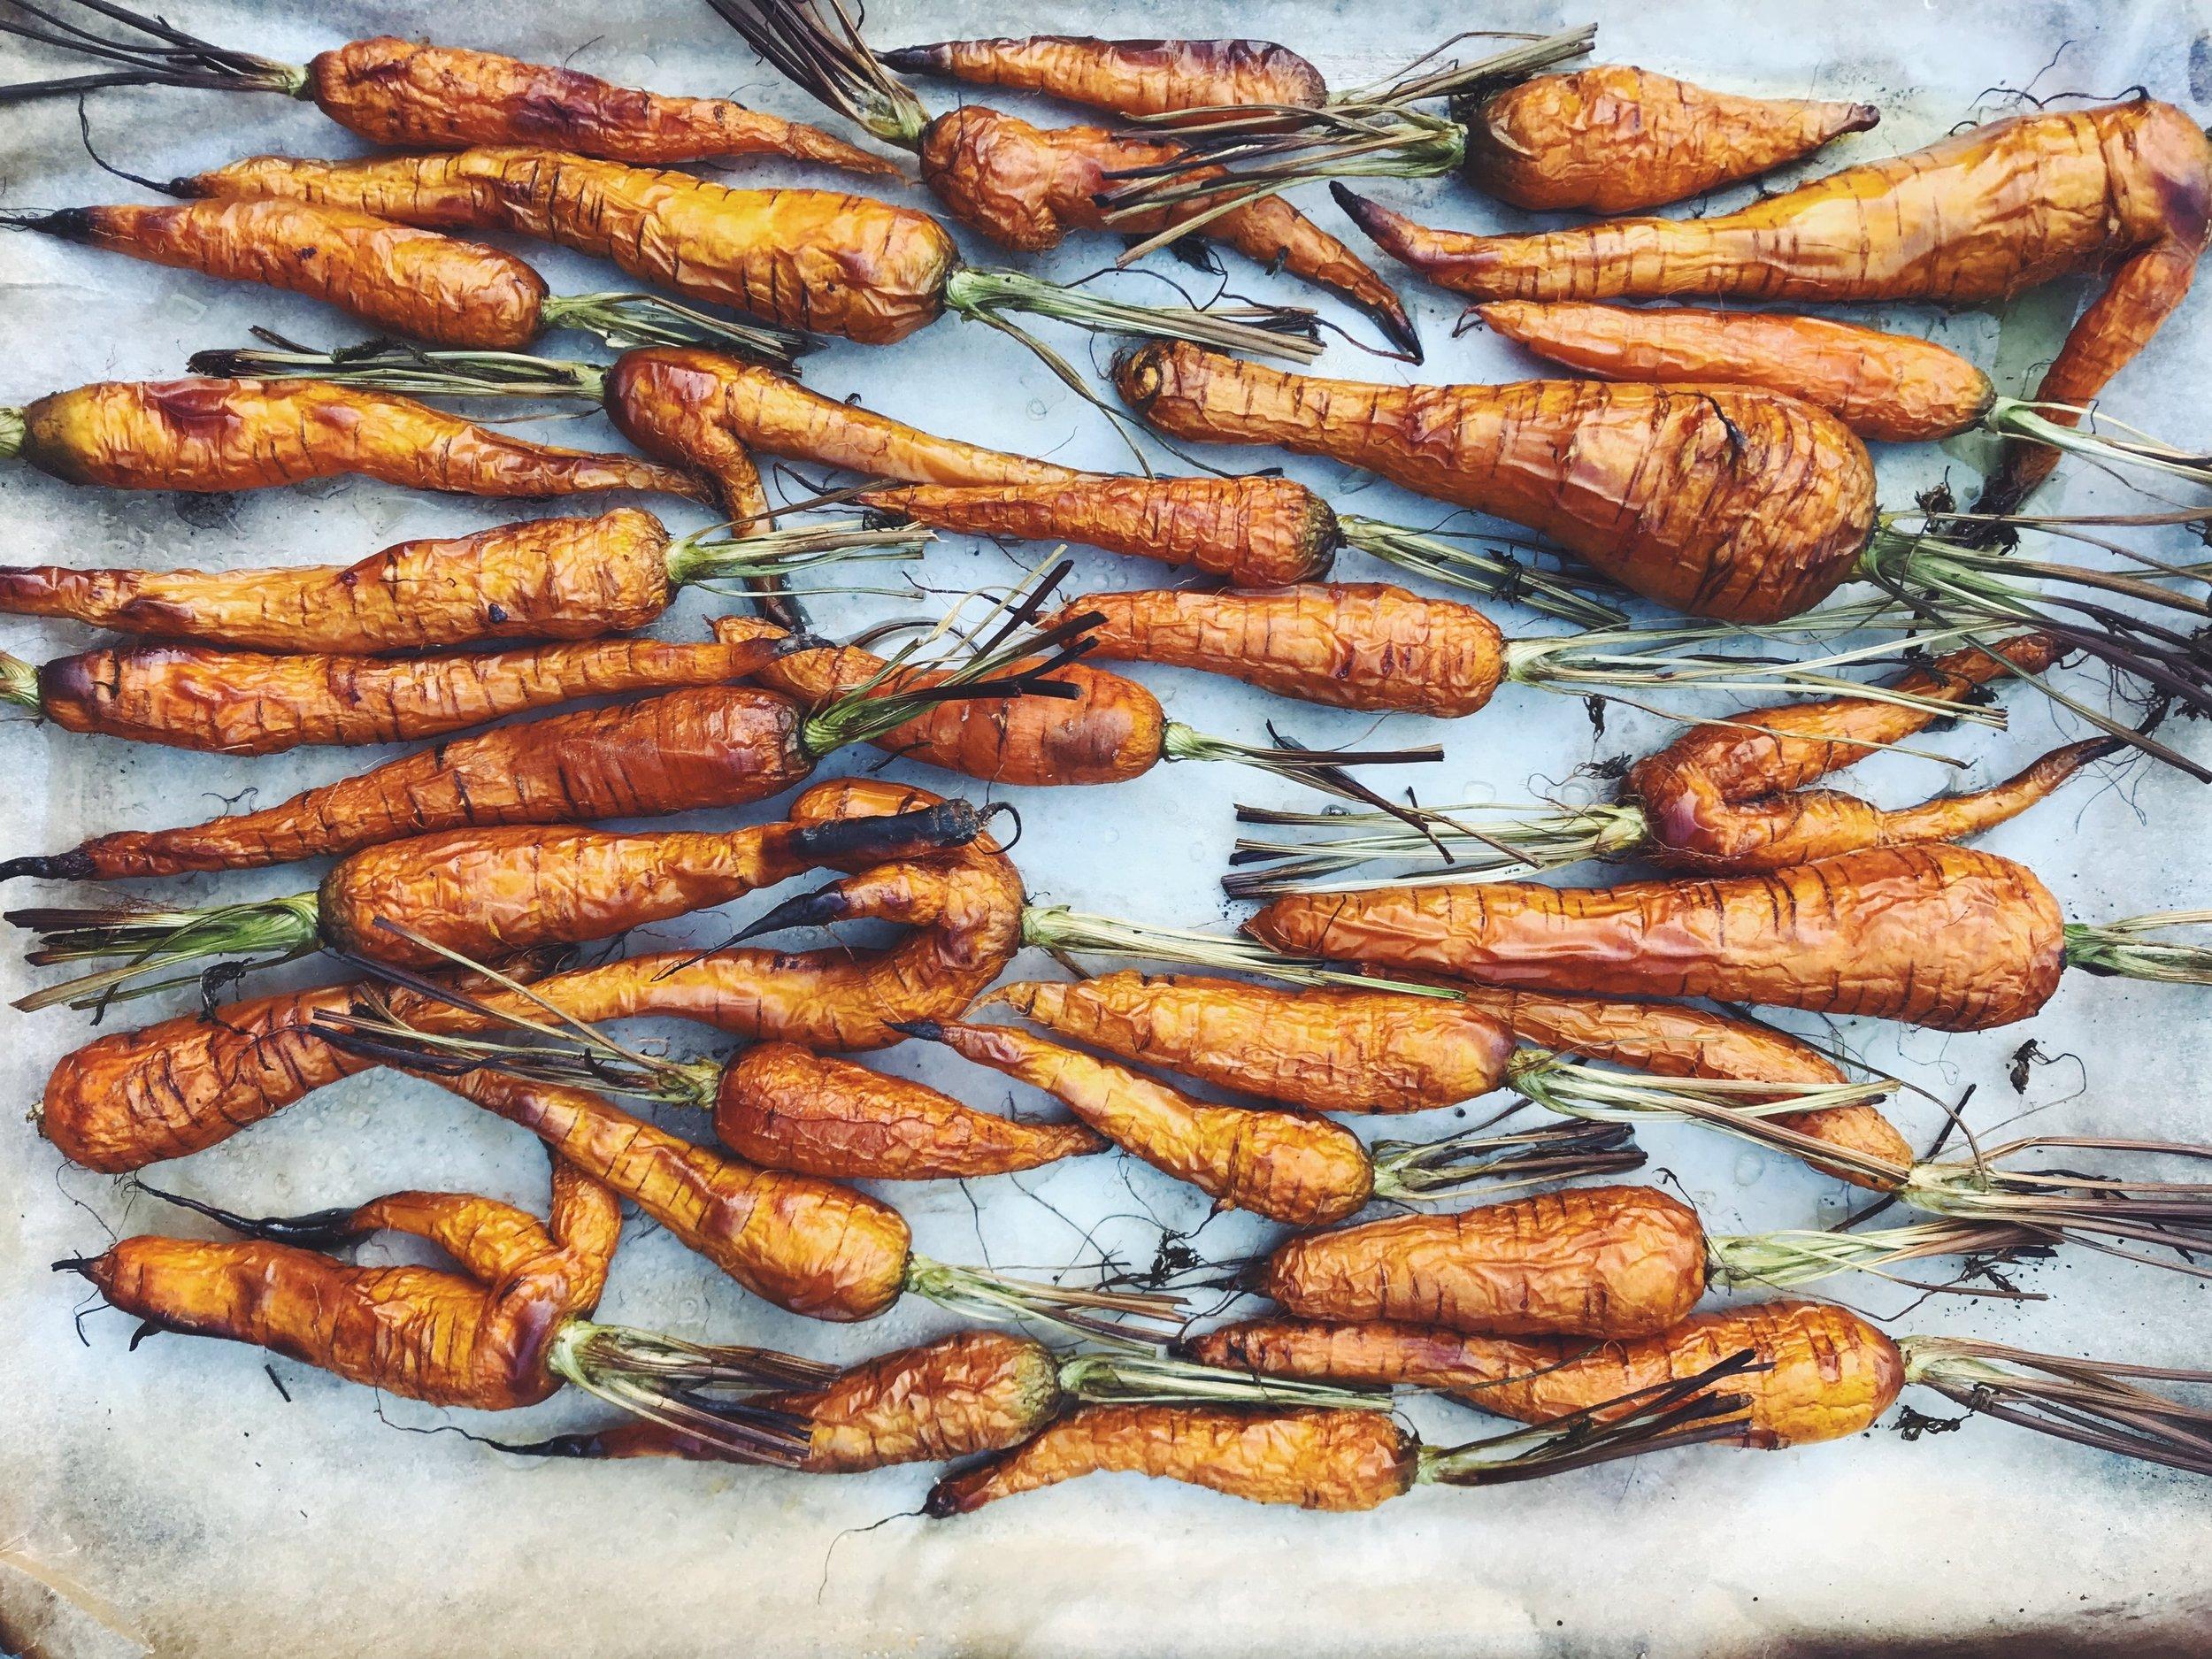 roasted carrots.JPG